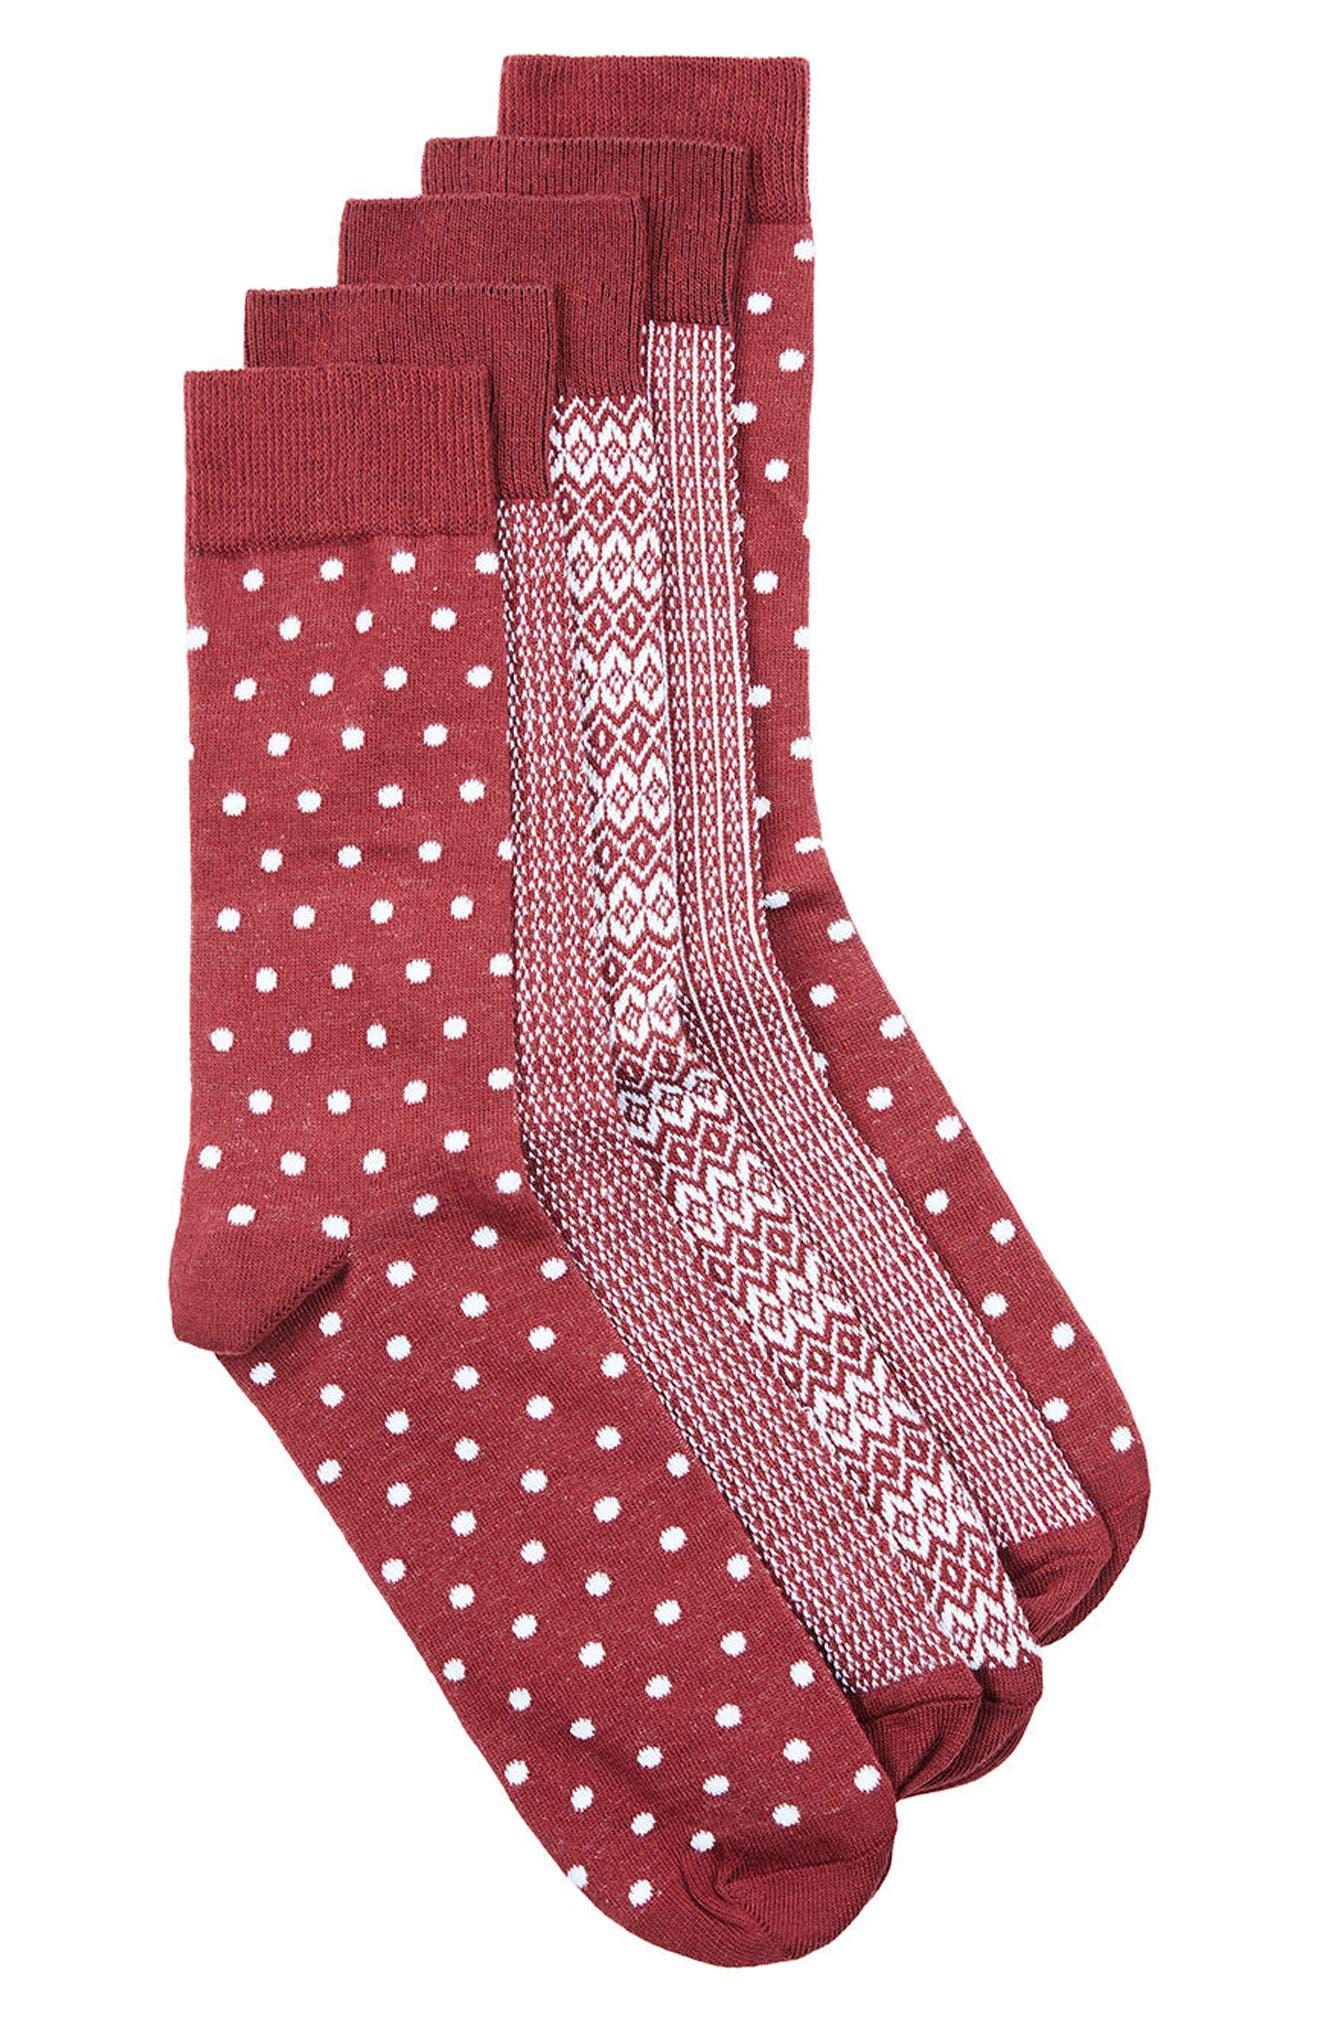 Topman Mixed Pattern 5-Pack Socks